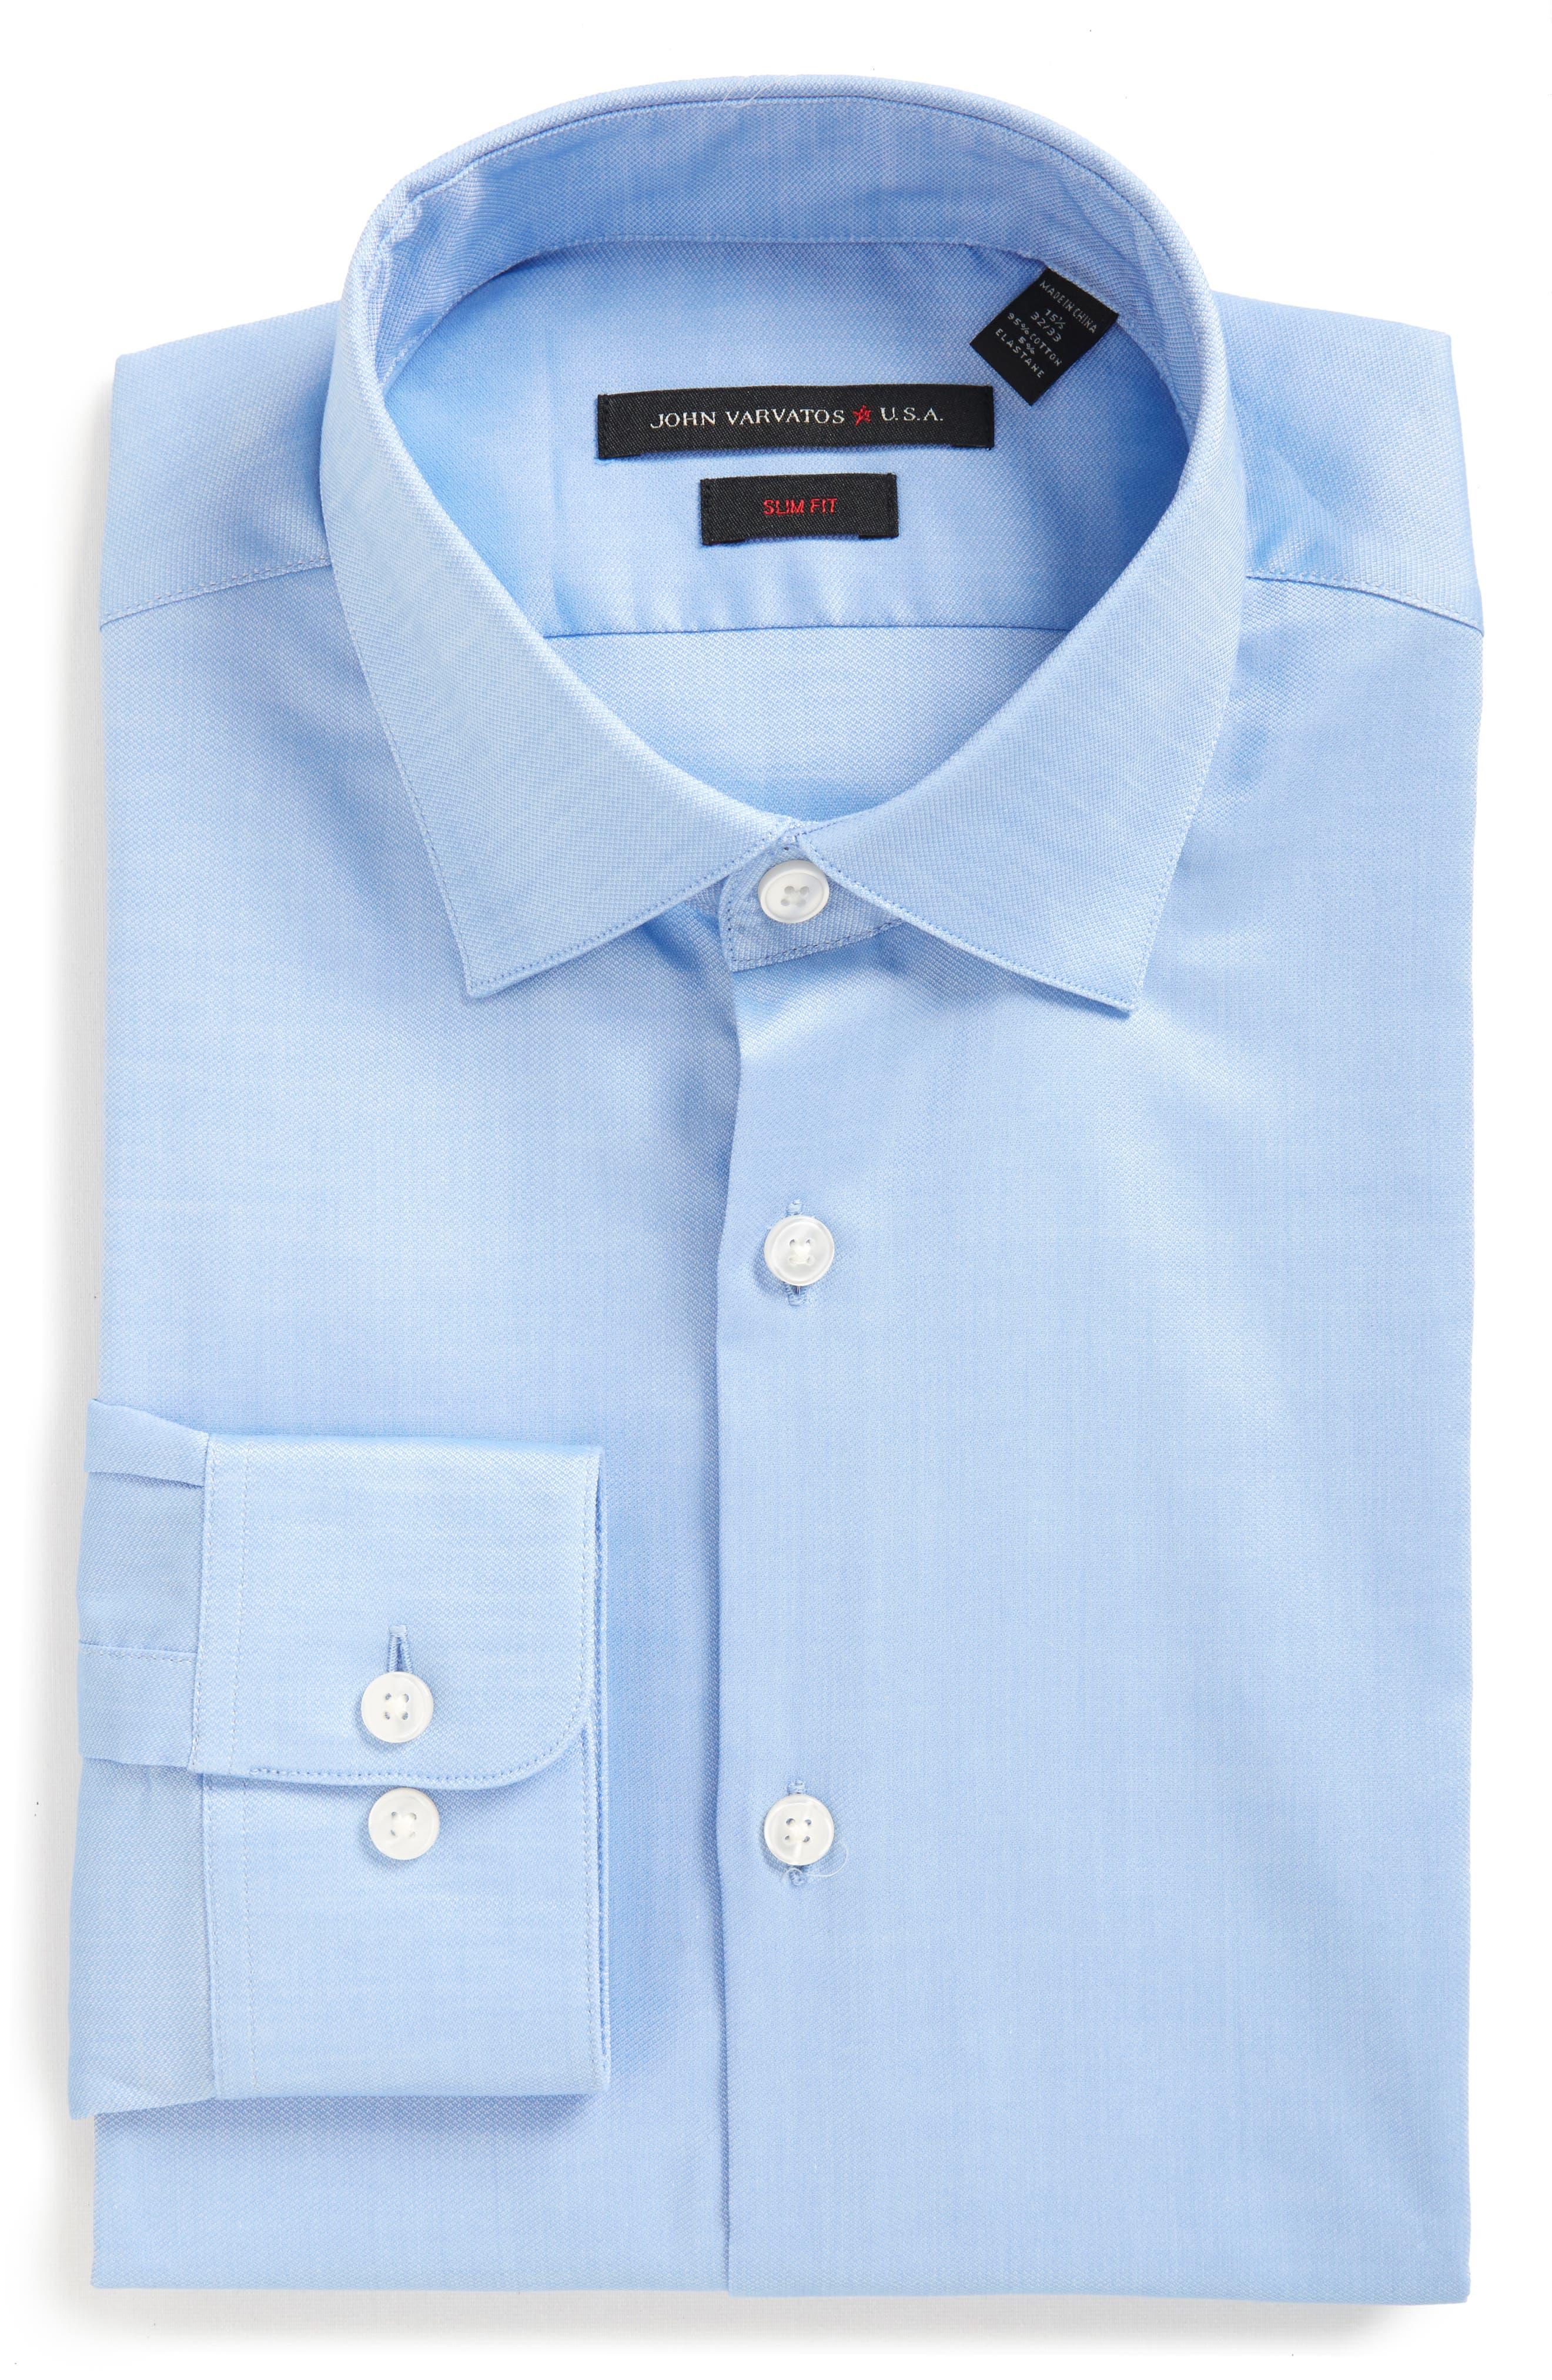 Soho Slim Fit Stretch Solid Dress Shirt,                             Alternate thumbnail 2, color,                             ATLANTIC BLUE